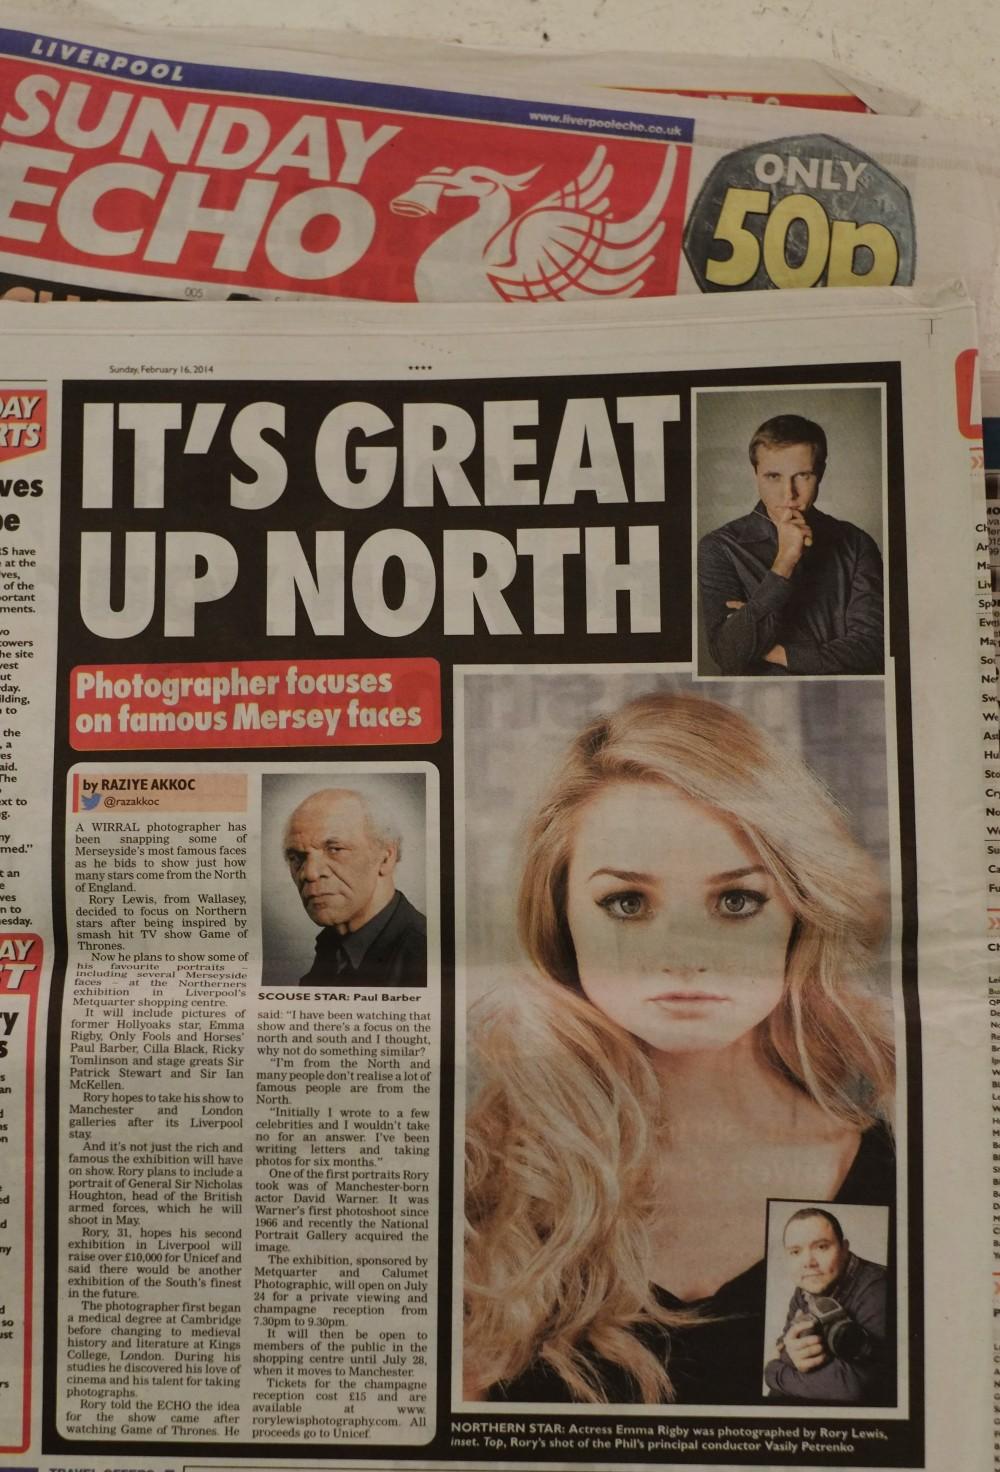 Liverpool Echo February 16th 2014